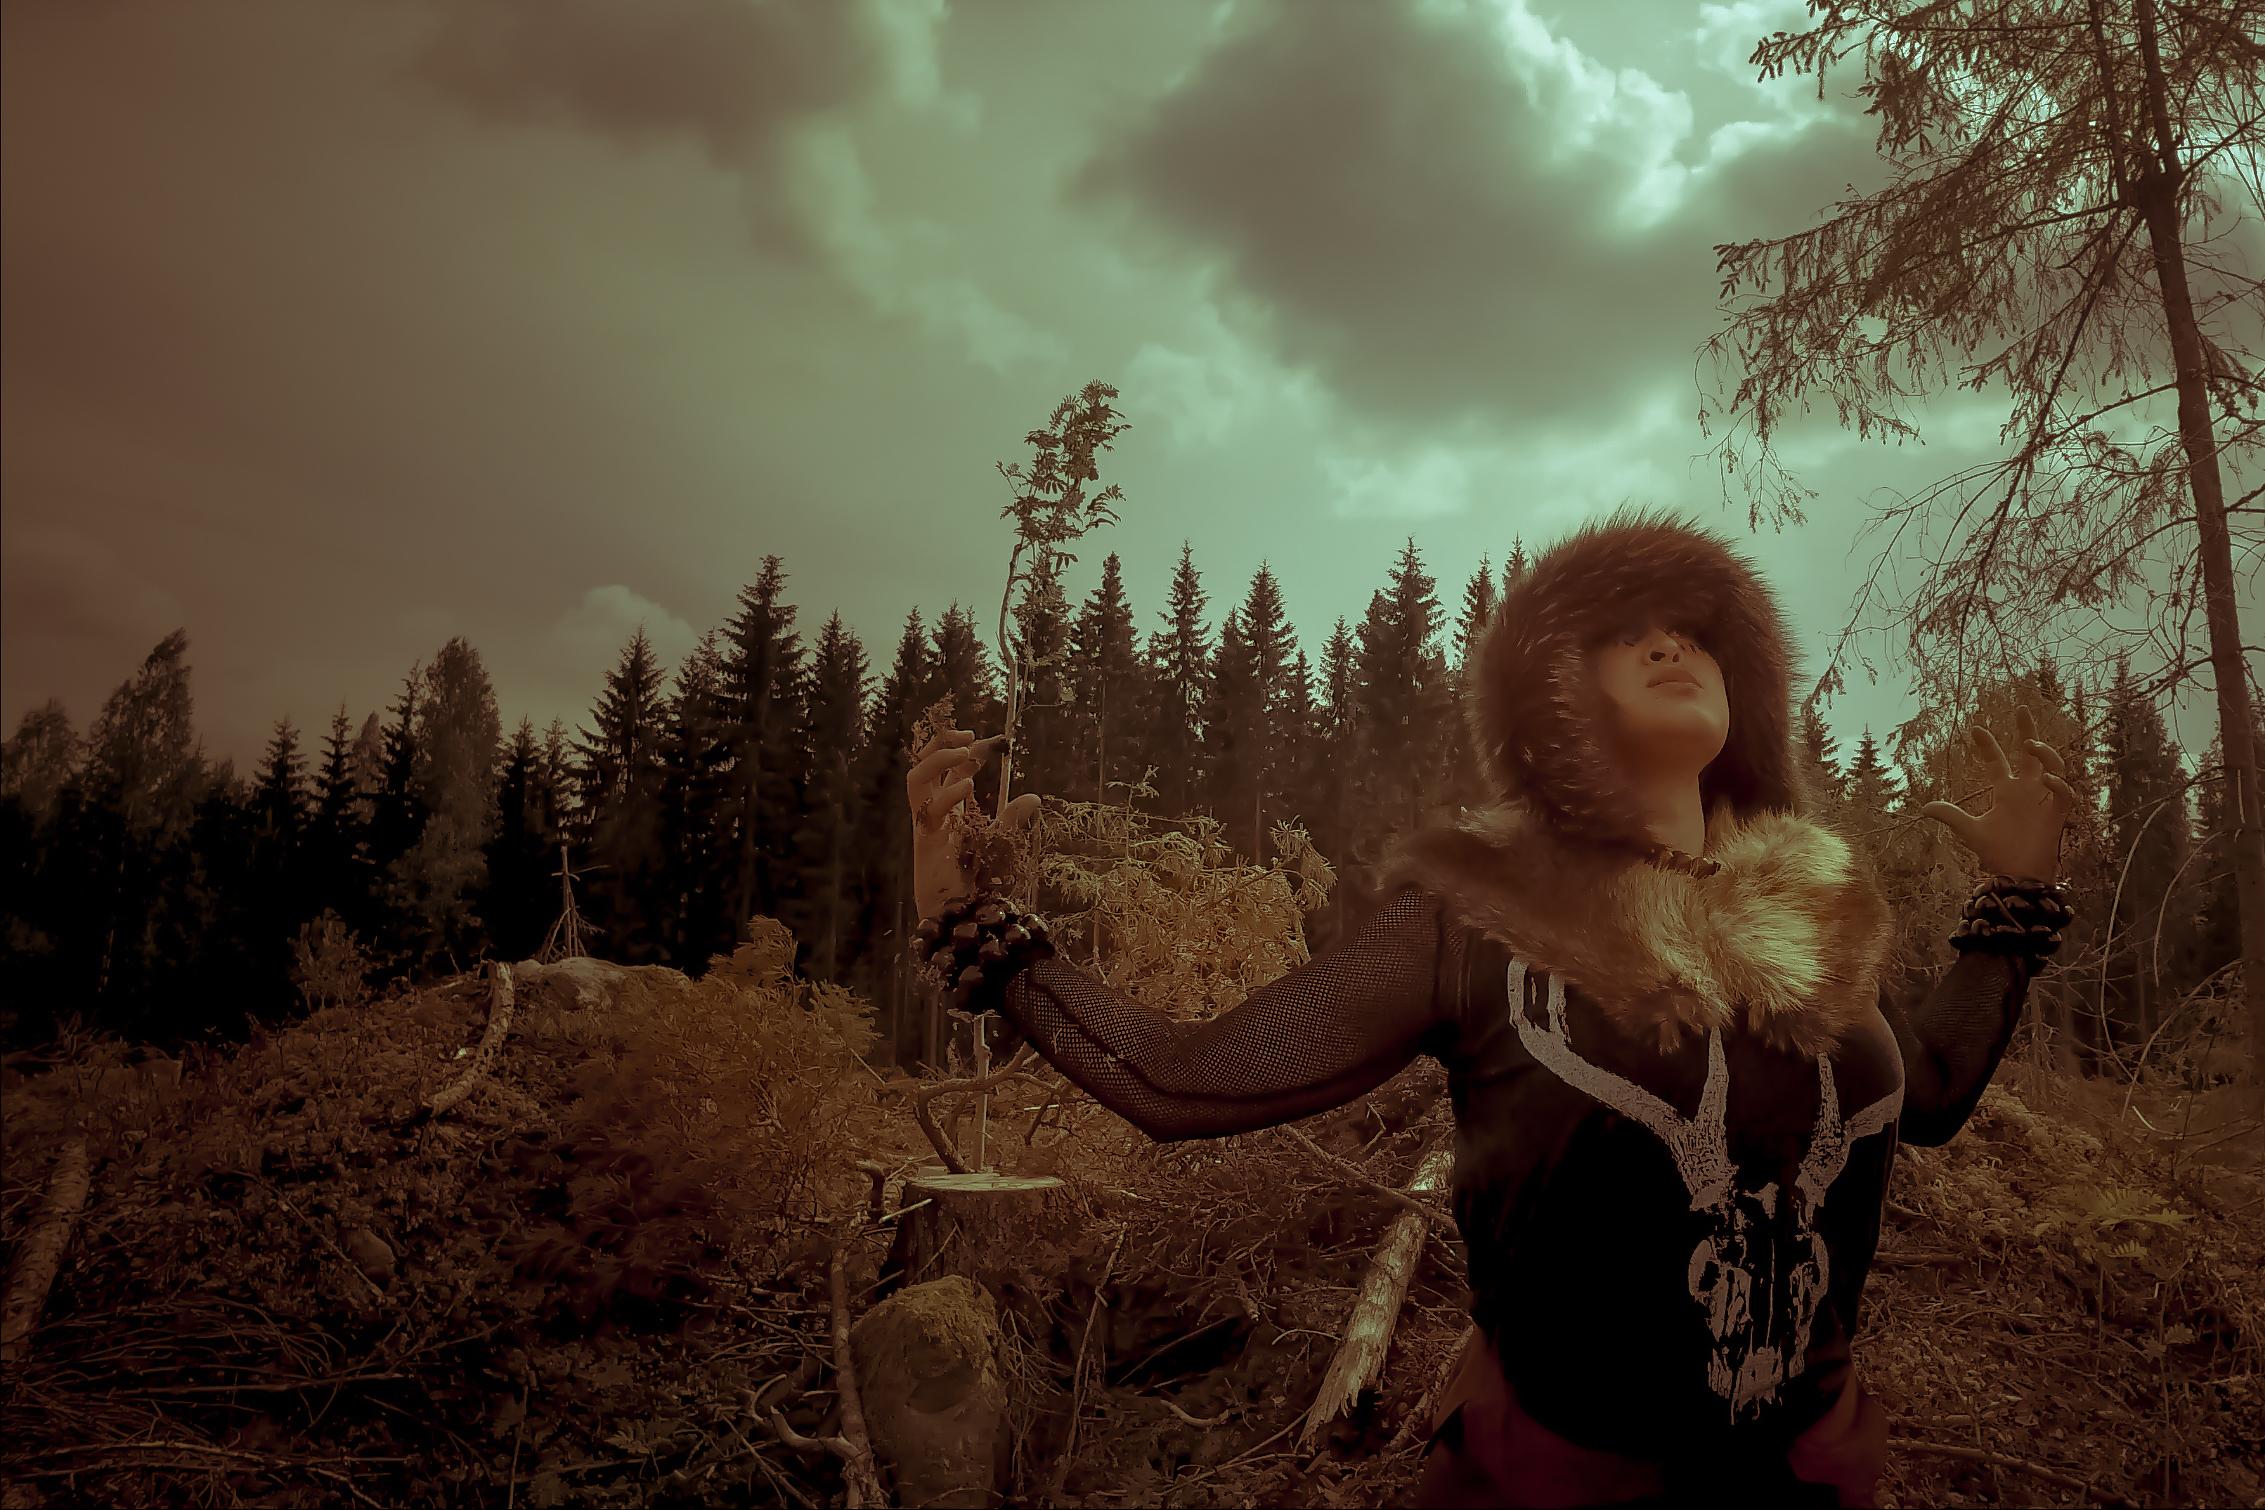 augmented-organism-environmentalism-eco-warrior-goddess.jpg